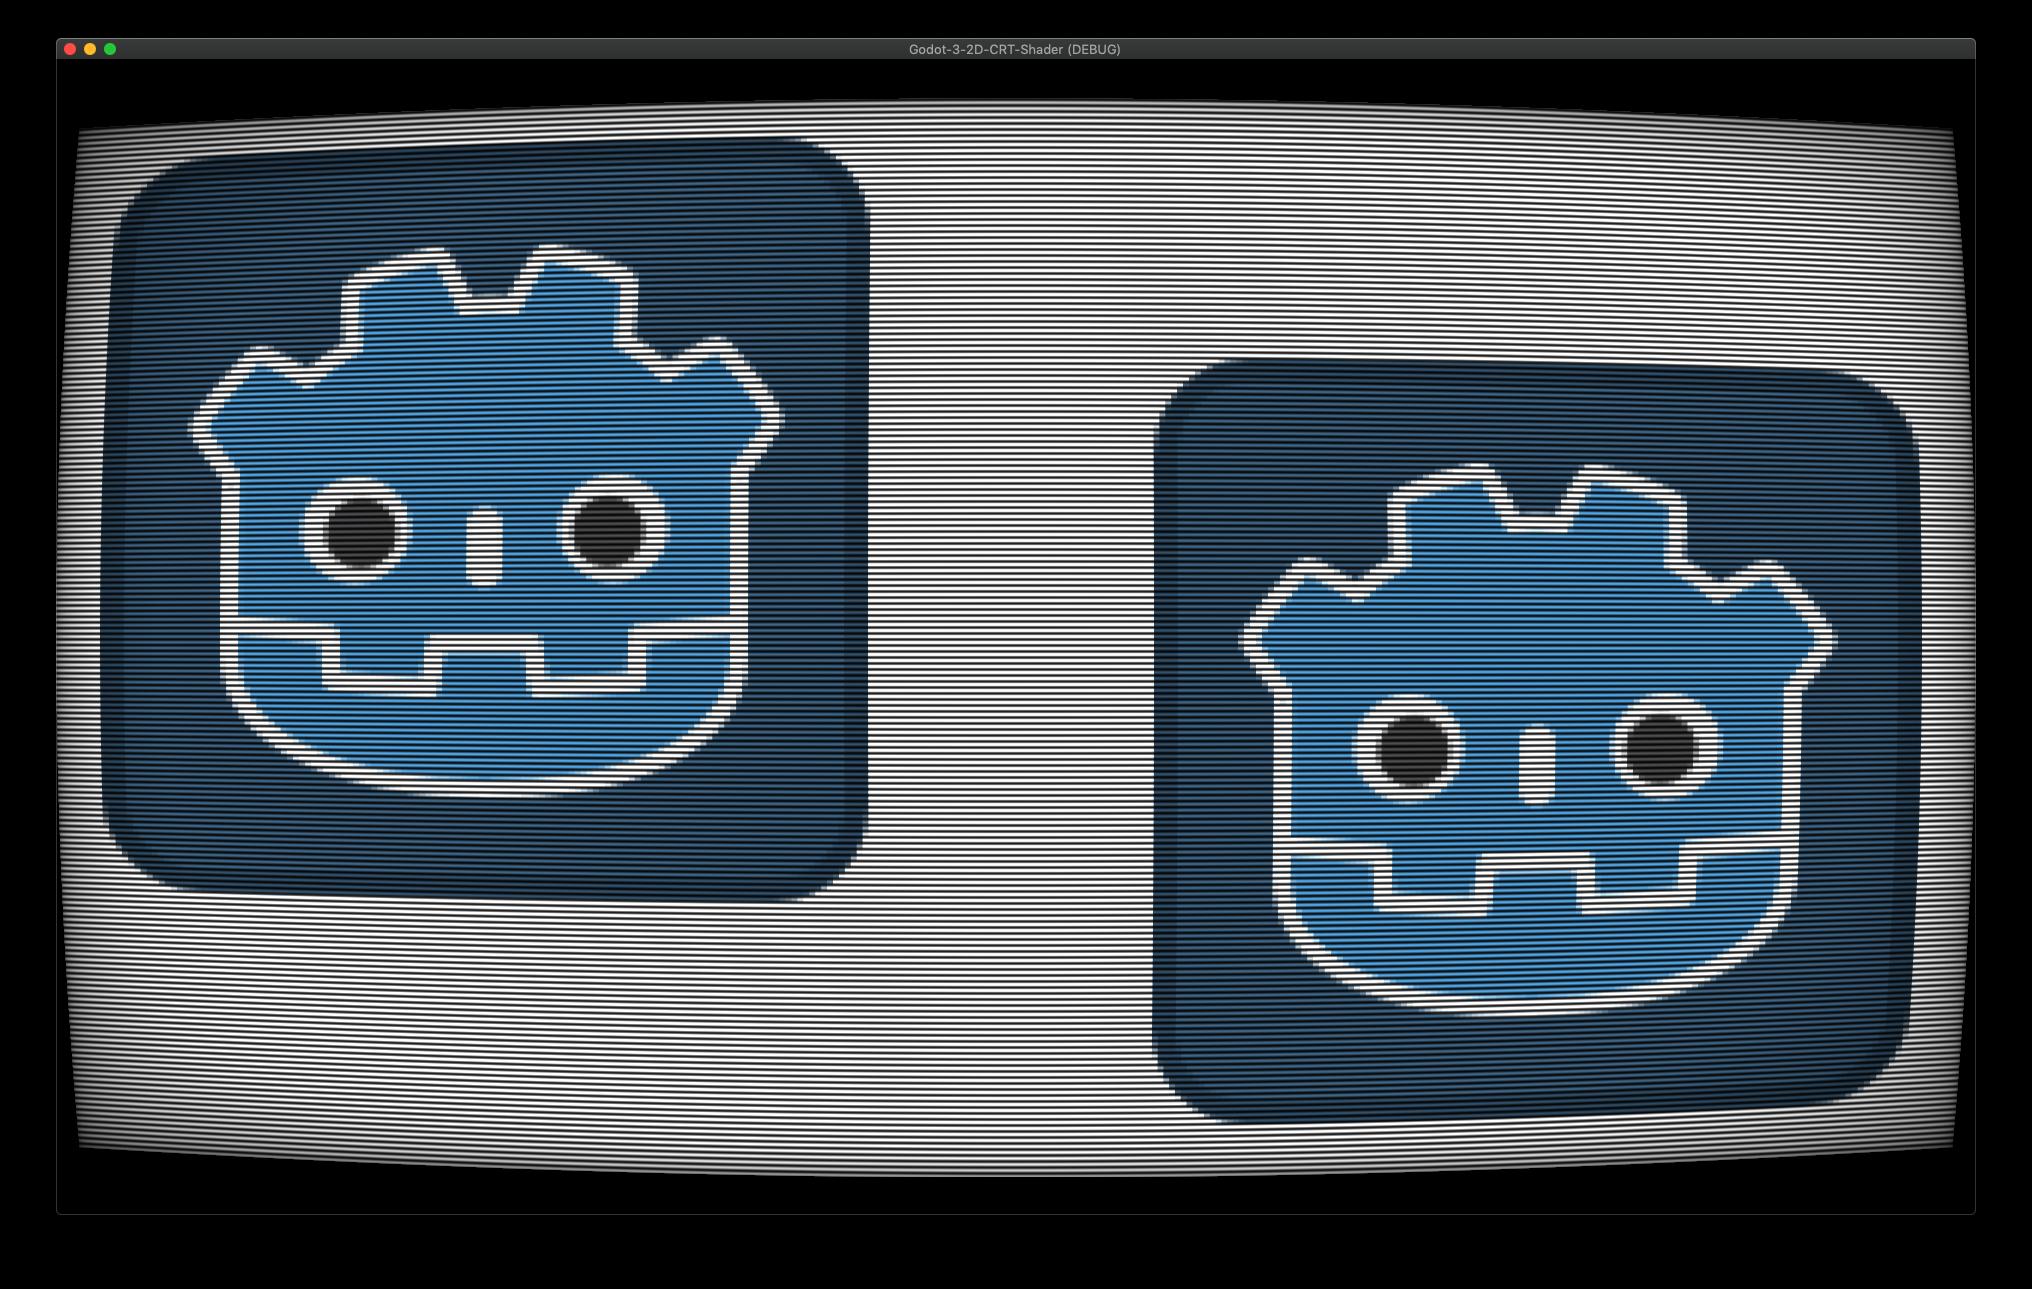 Godot 3 2D CRT Shader's icon